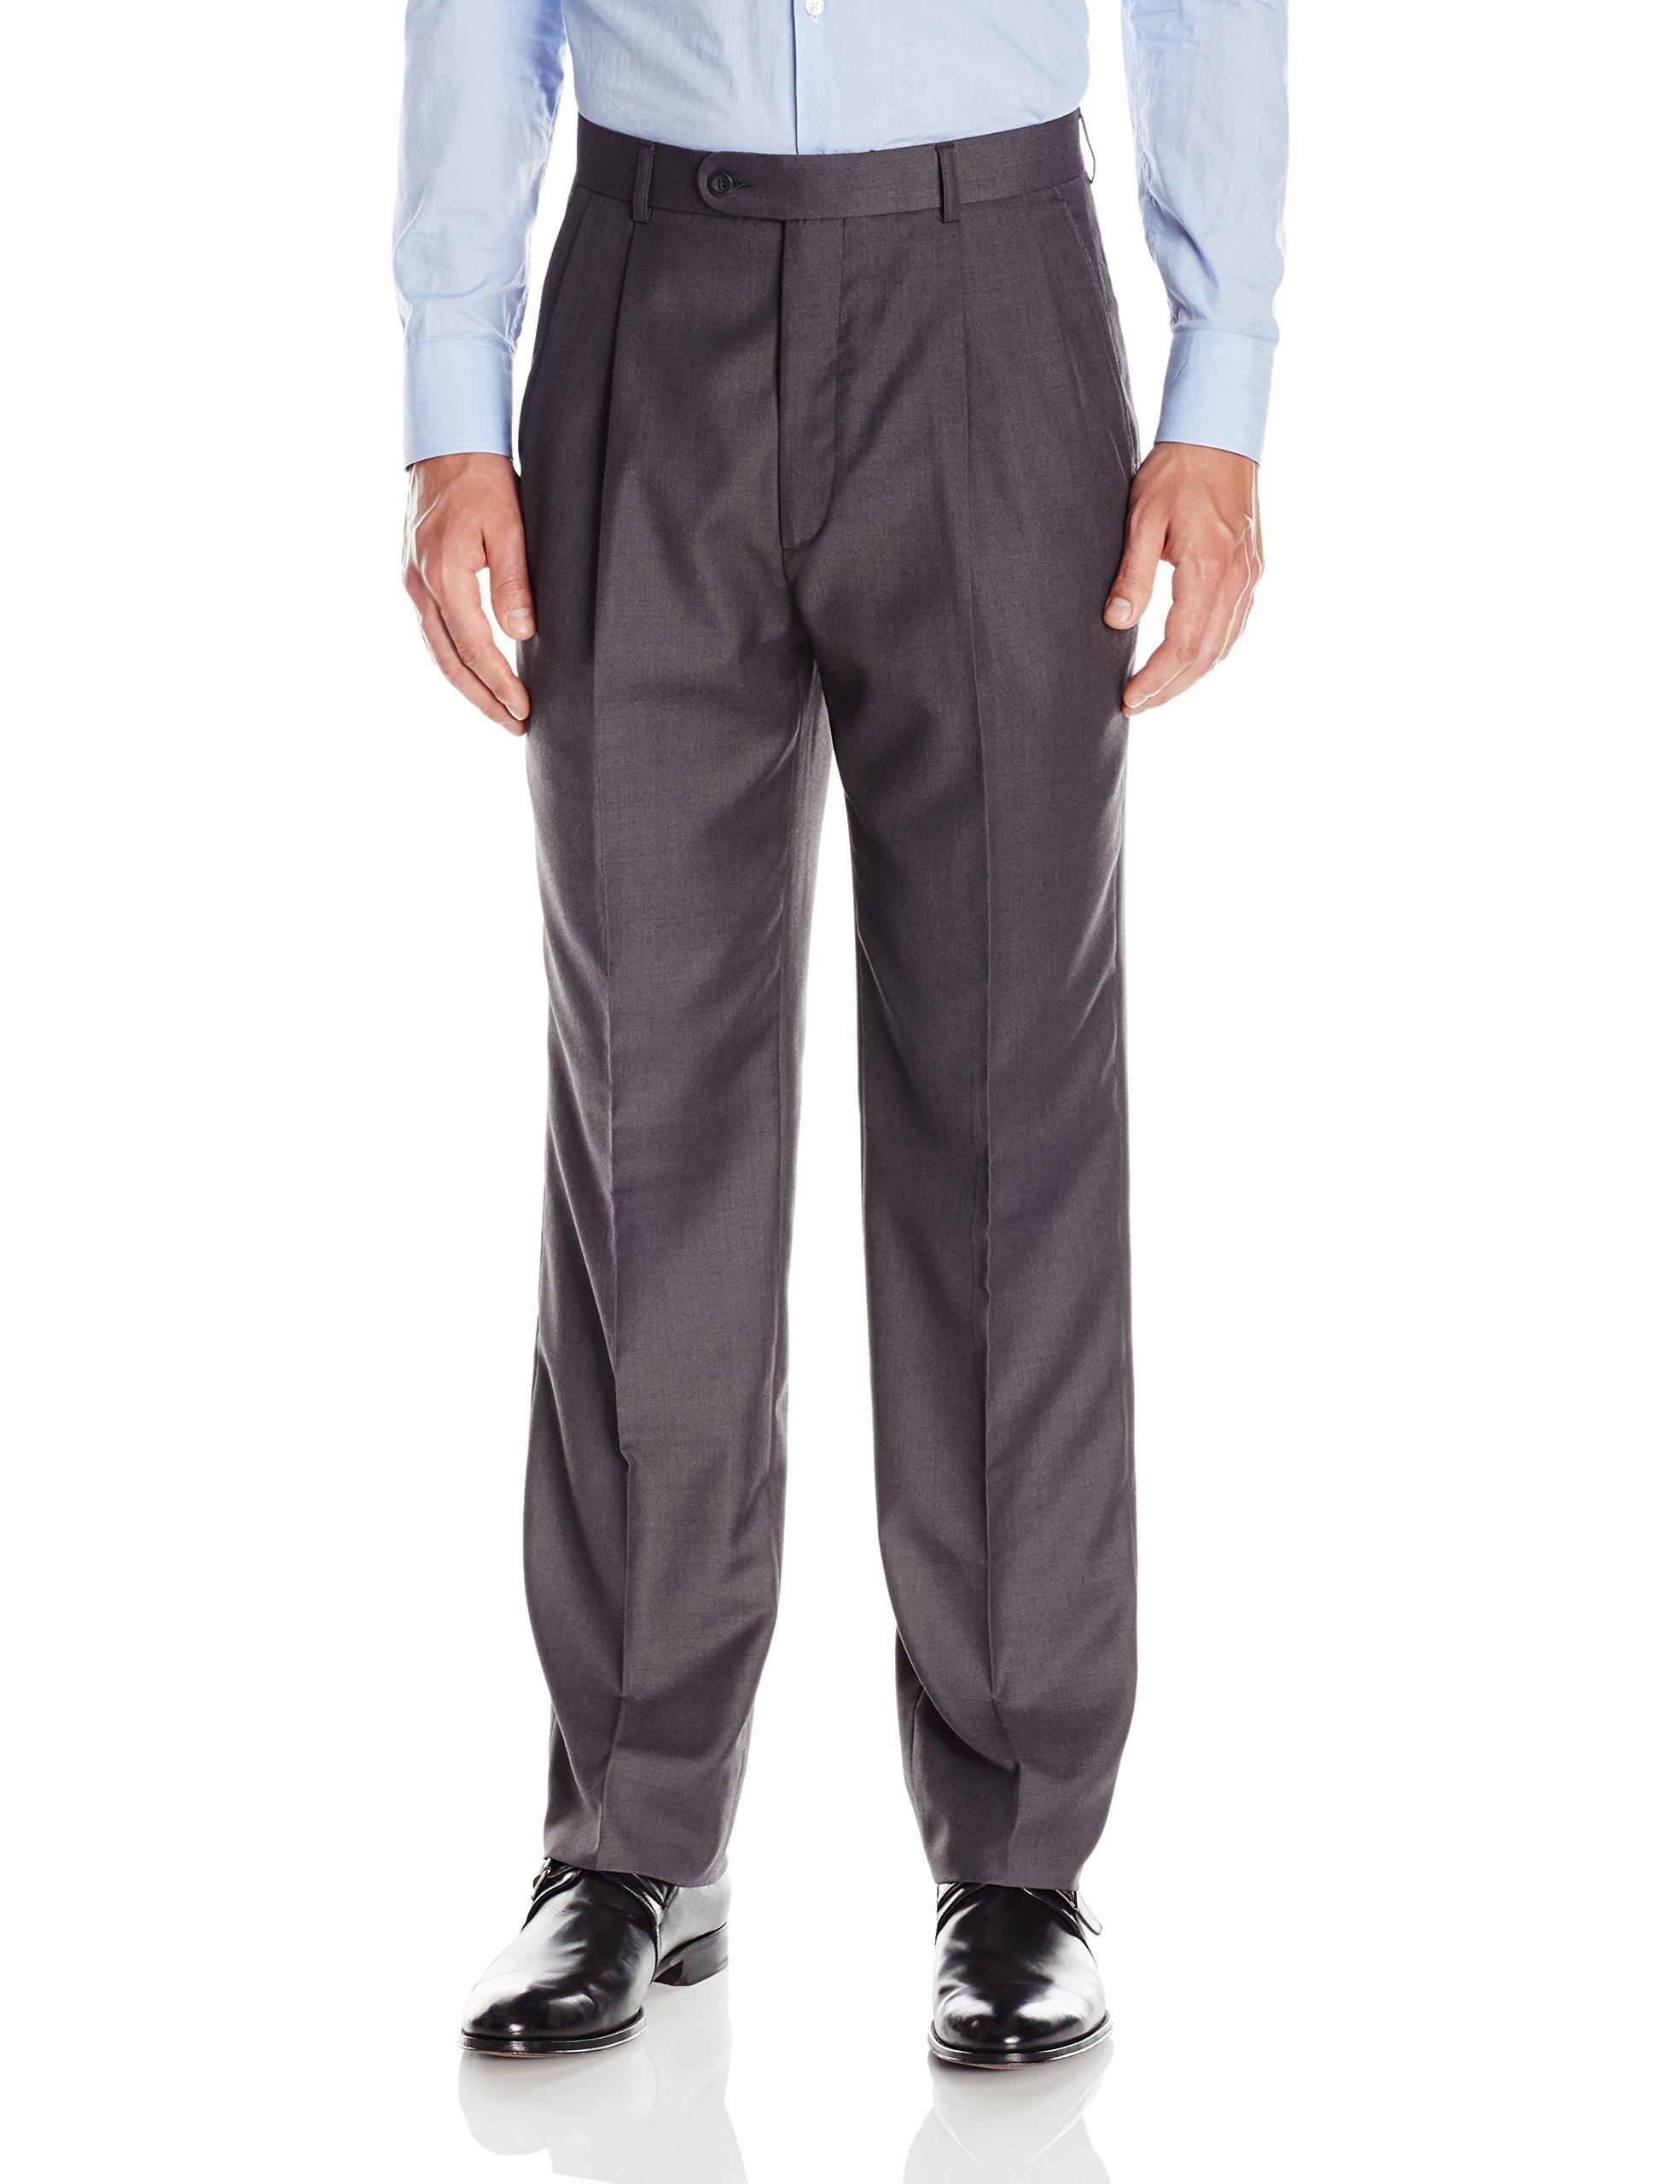 Linea Naturale Men's Pleated Travel Genius Microfiber Trouser, Light Grey, 38W